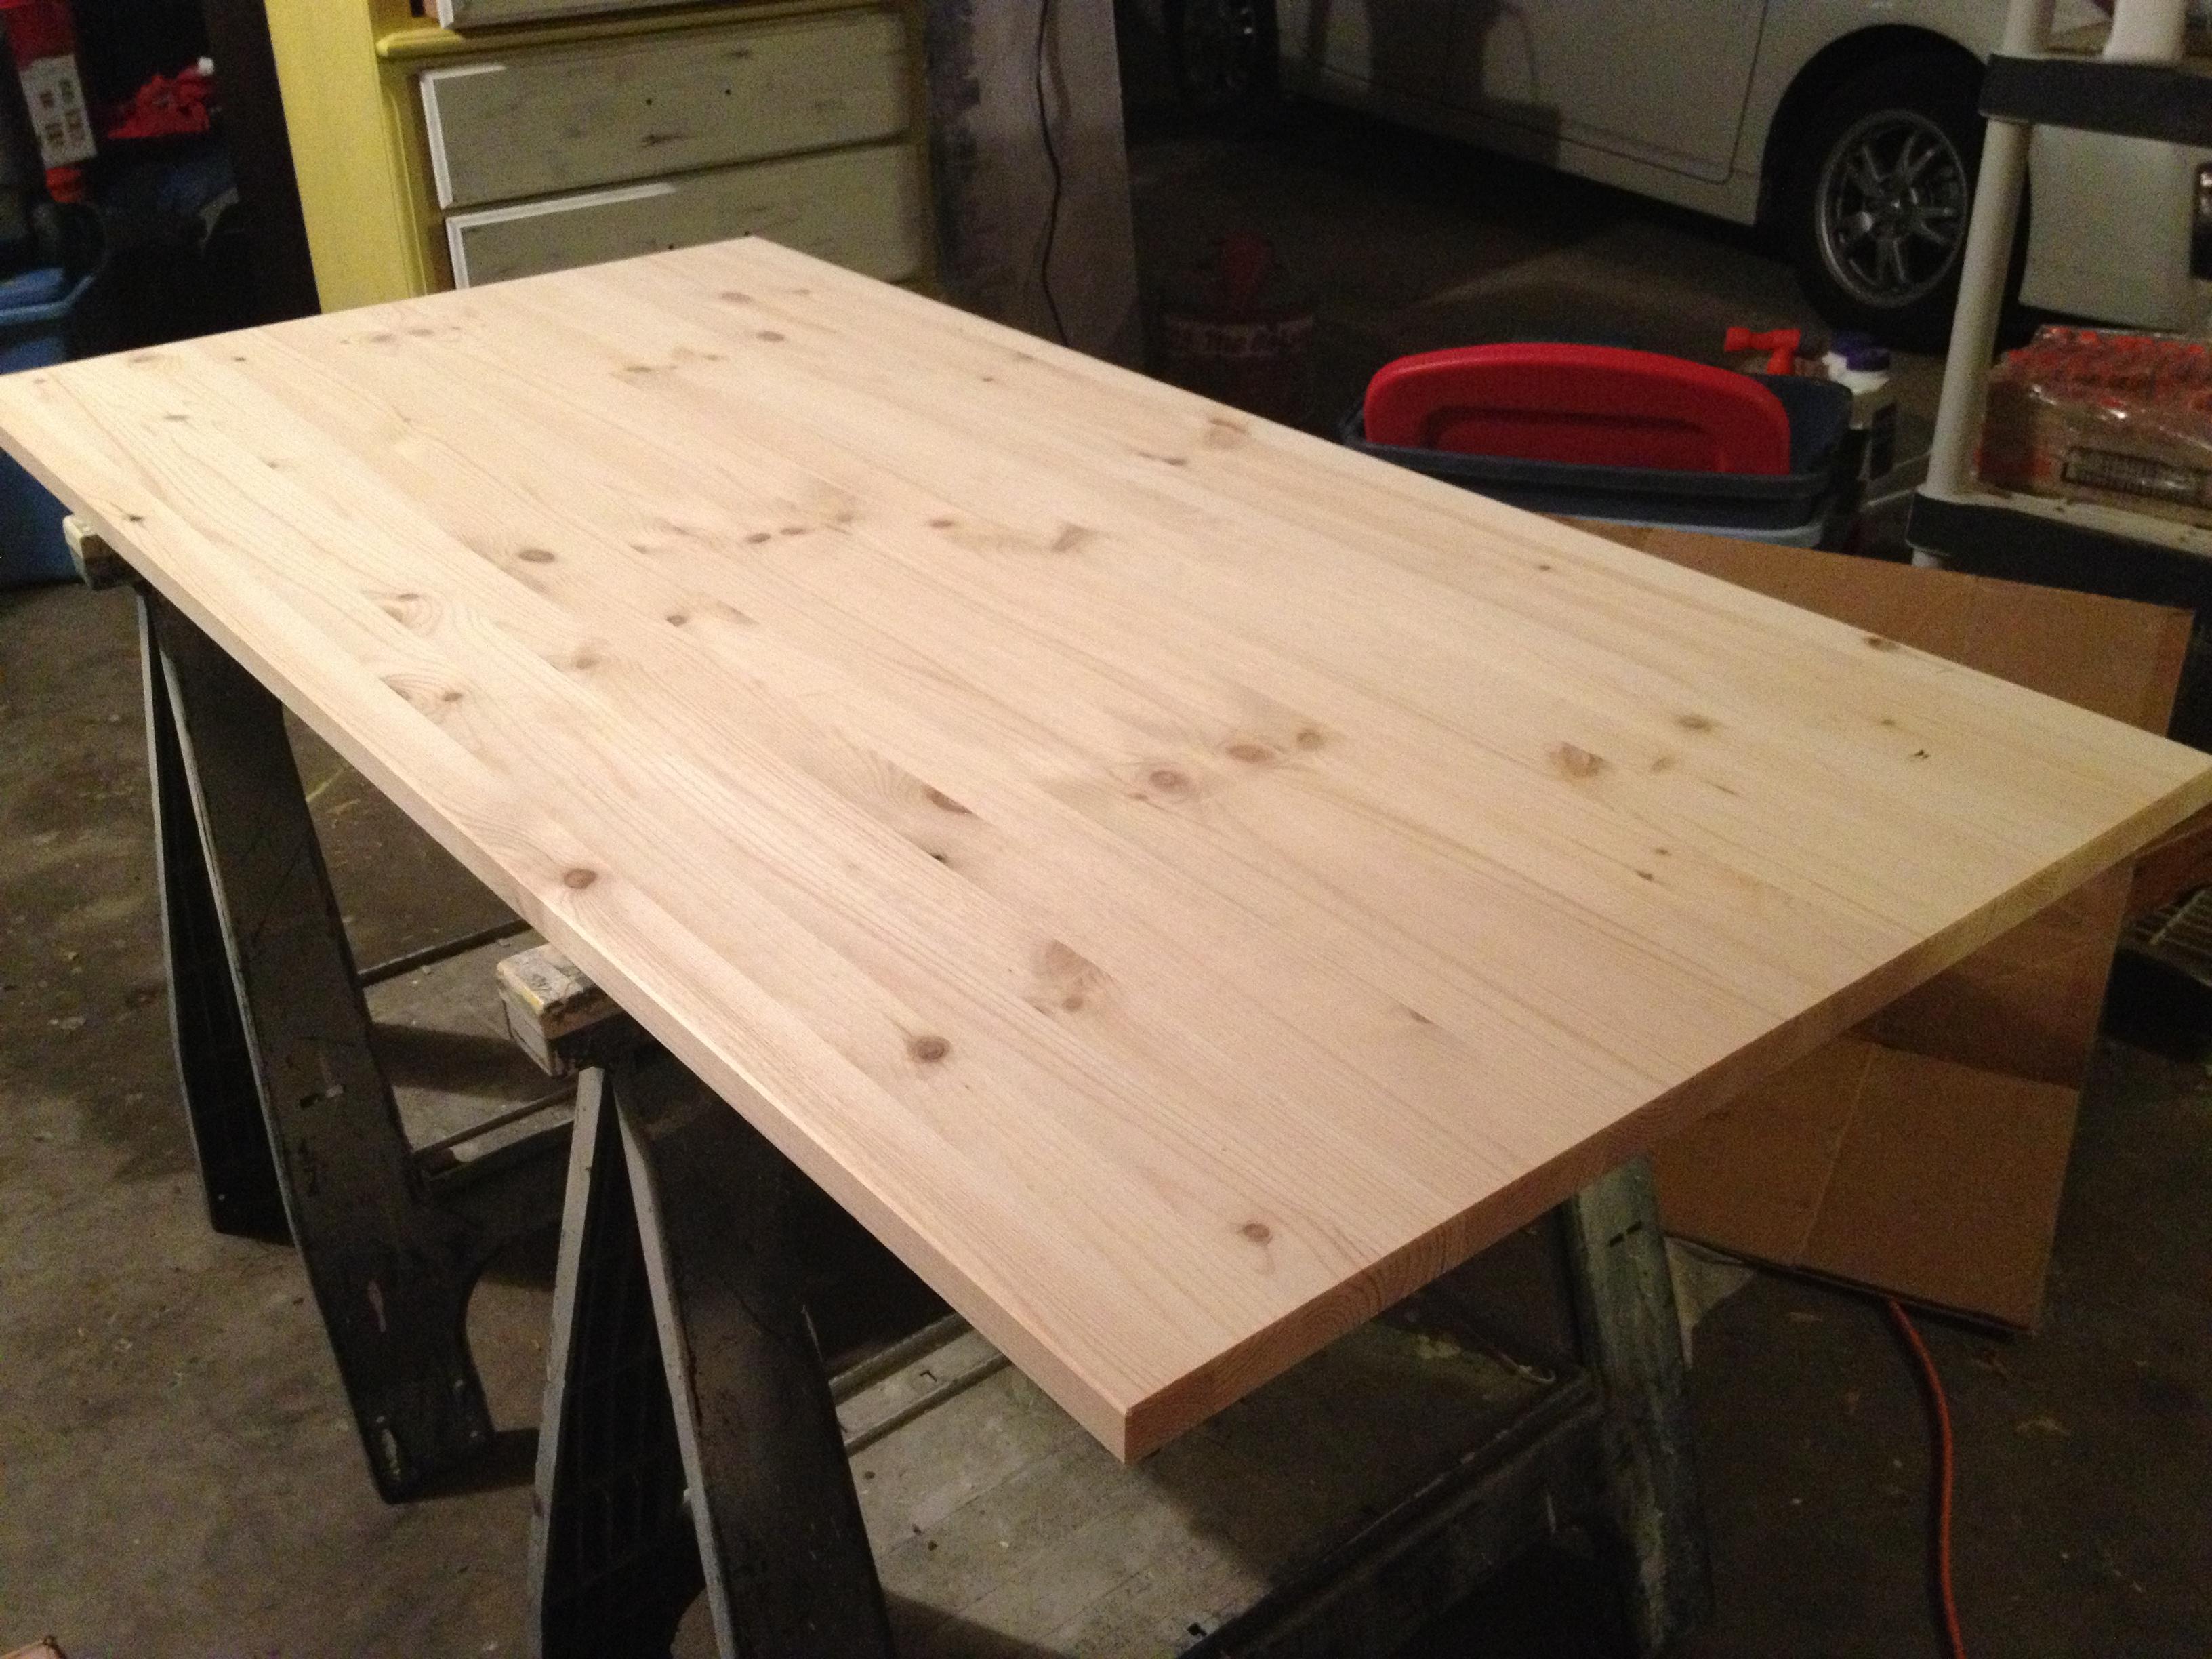 storage black price table w ikea nyboda enchanting reversible beige coffee top cm with